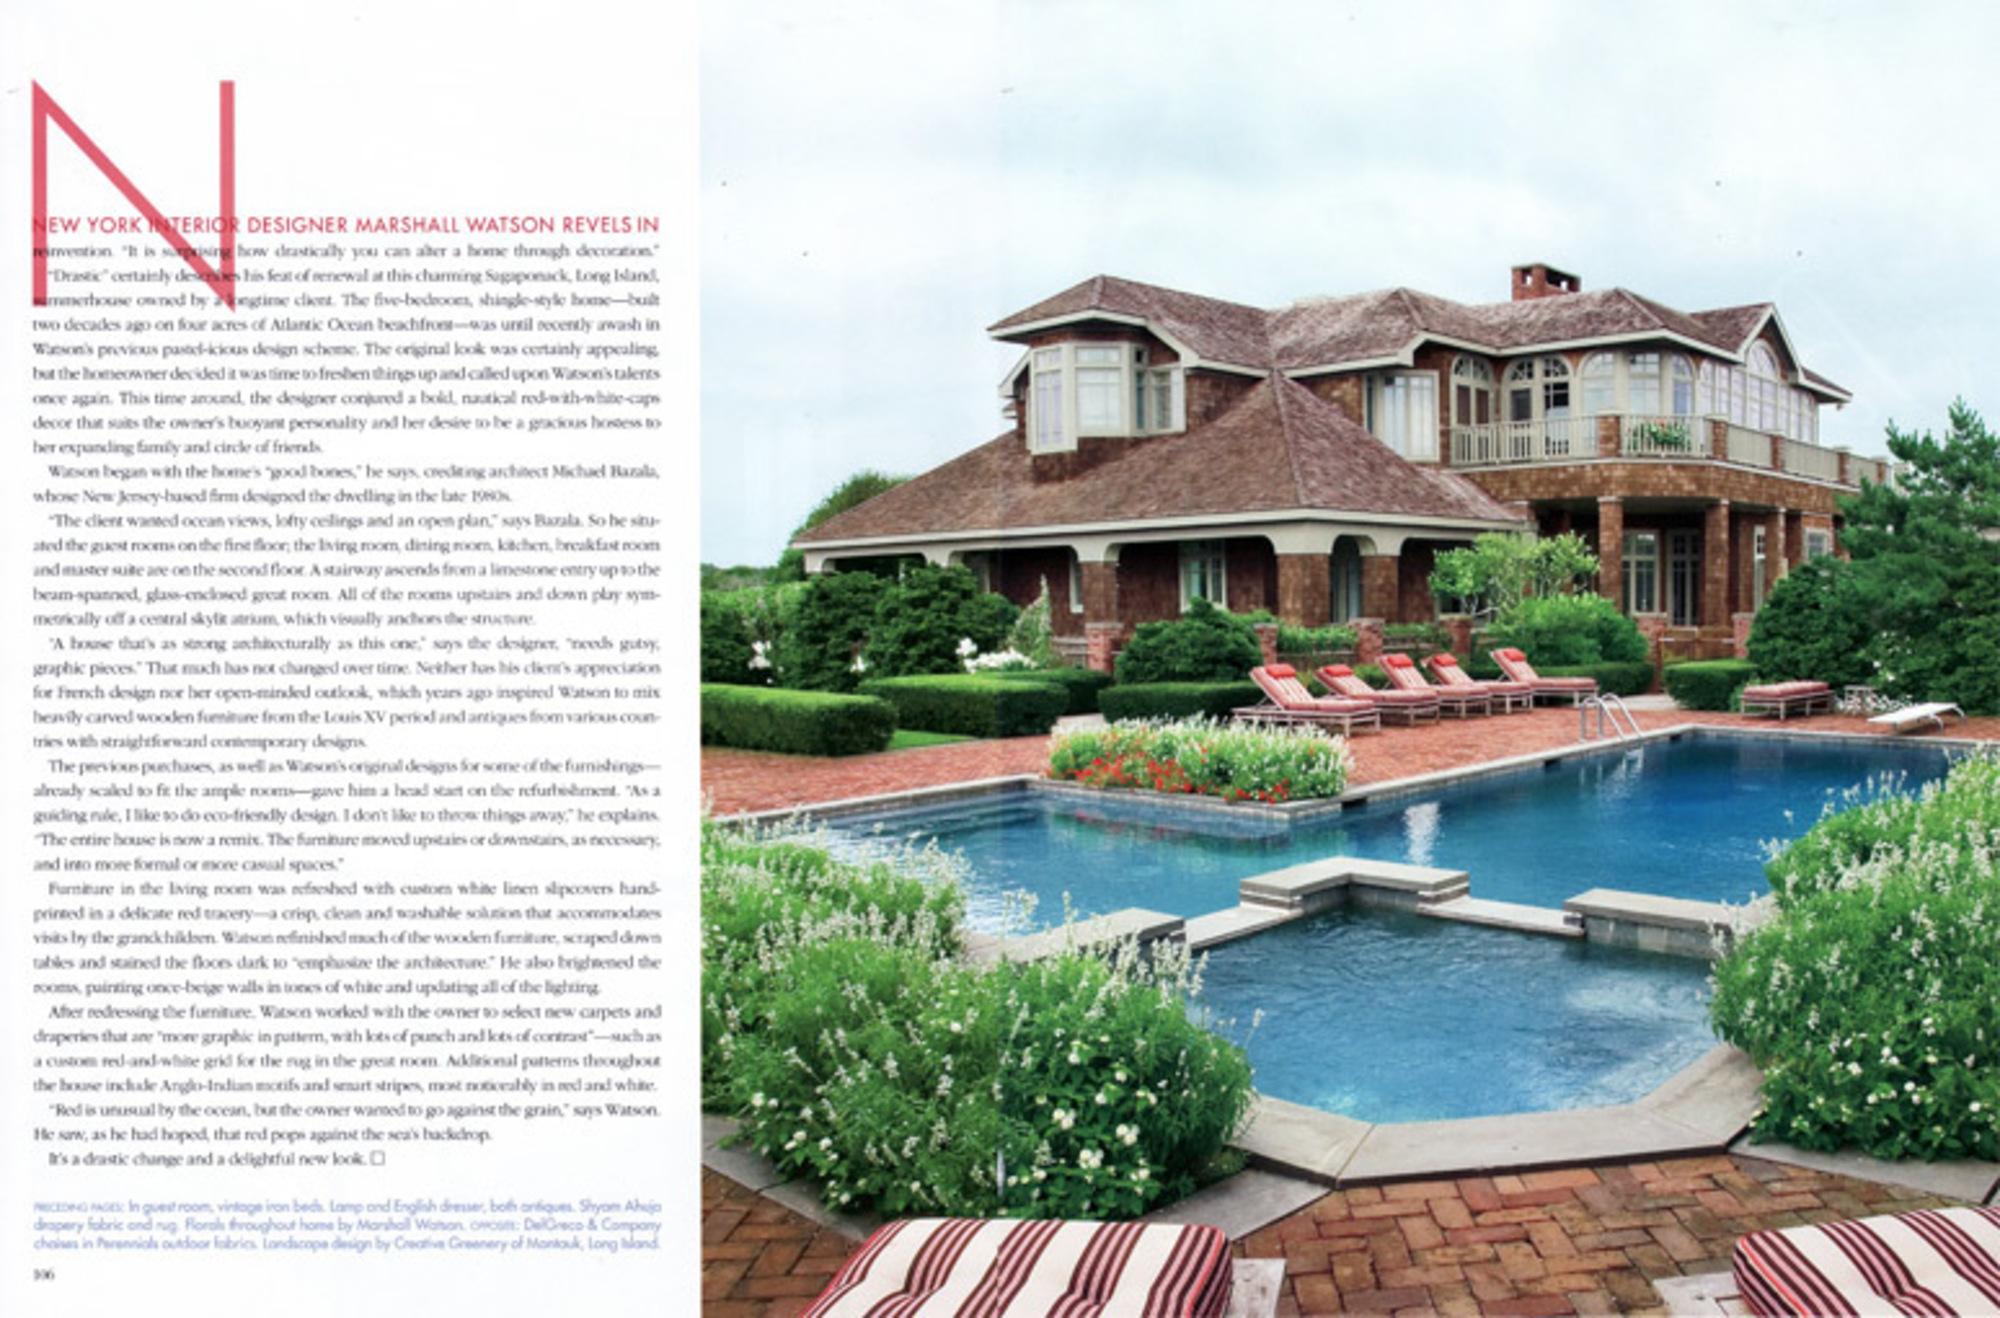 2009/07 Veranda Article Spread